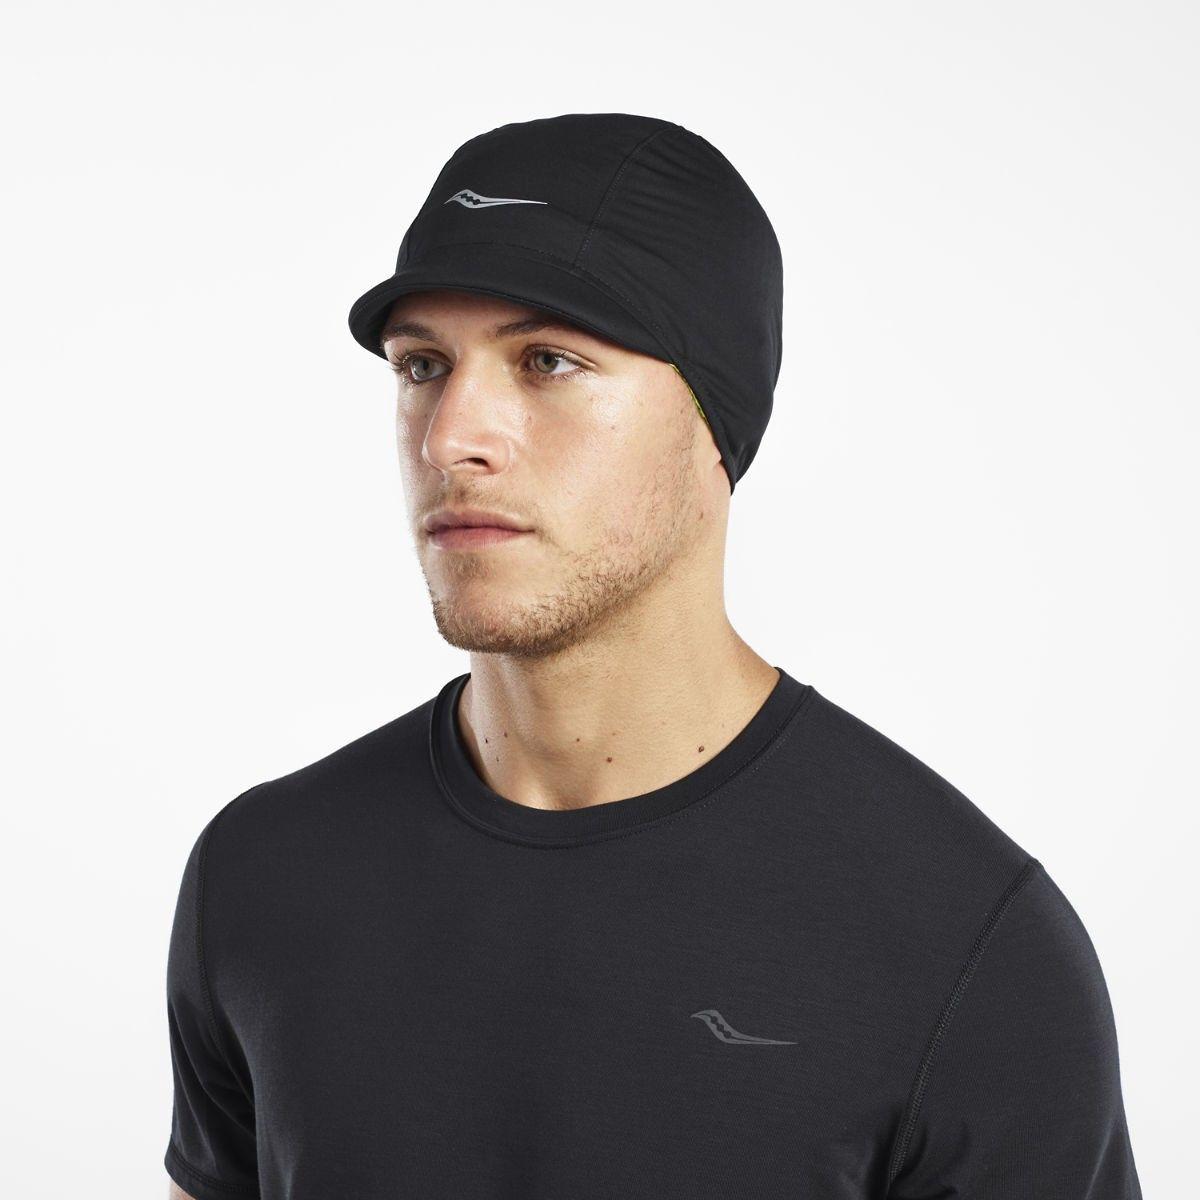 46b2e955c51 Saucony razor hat saucony all saucony men hats cool stuff jpg 1200x1200 Saucony  hat